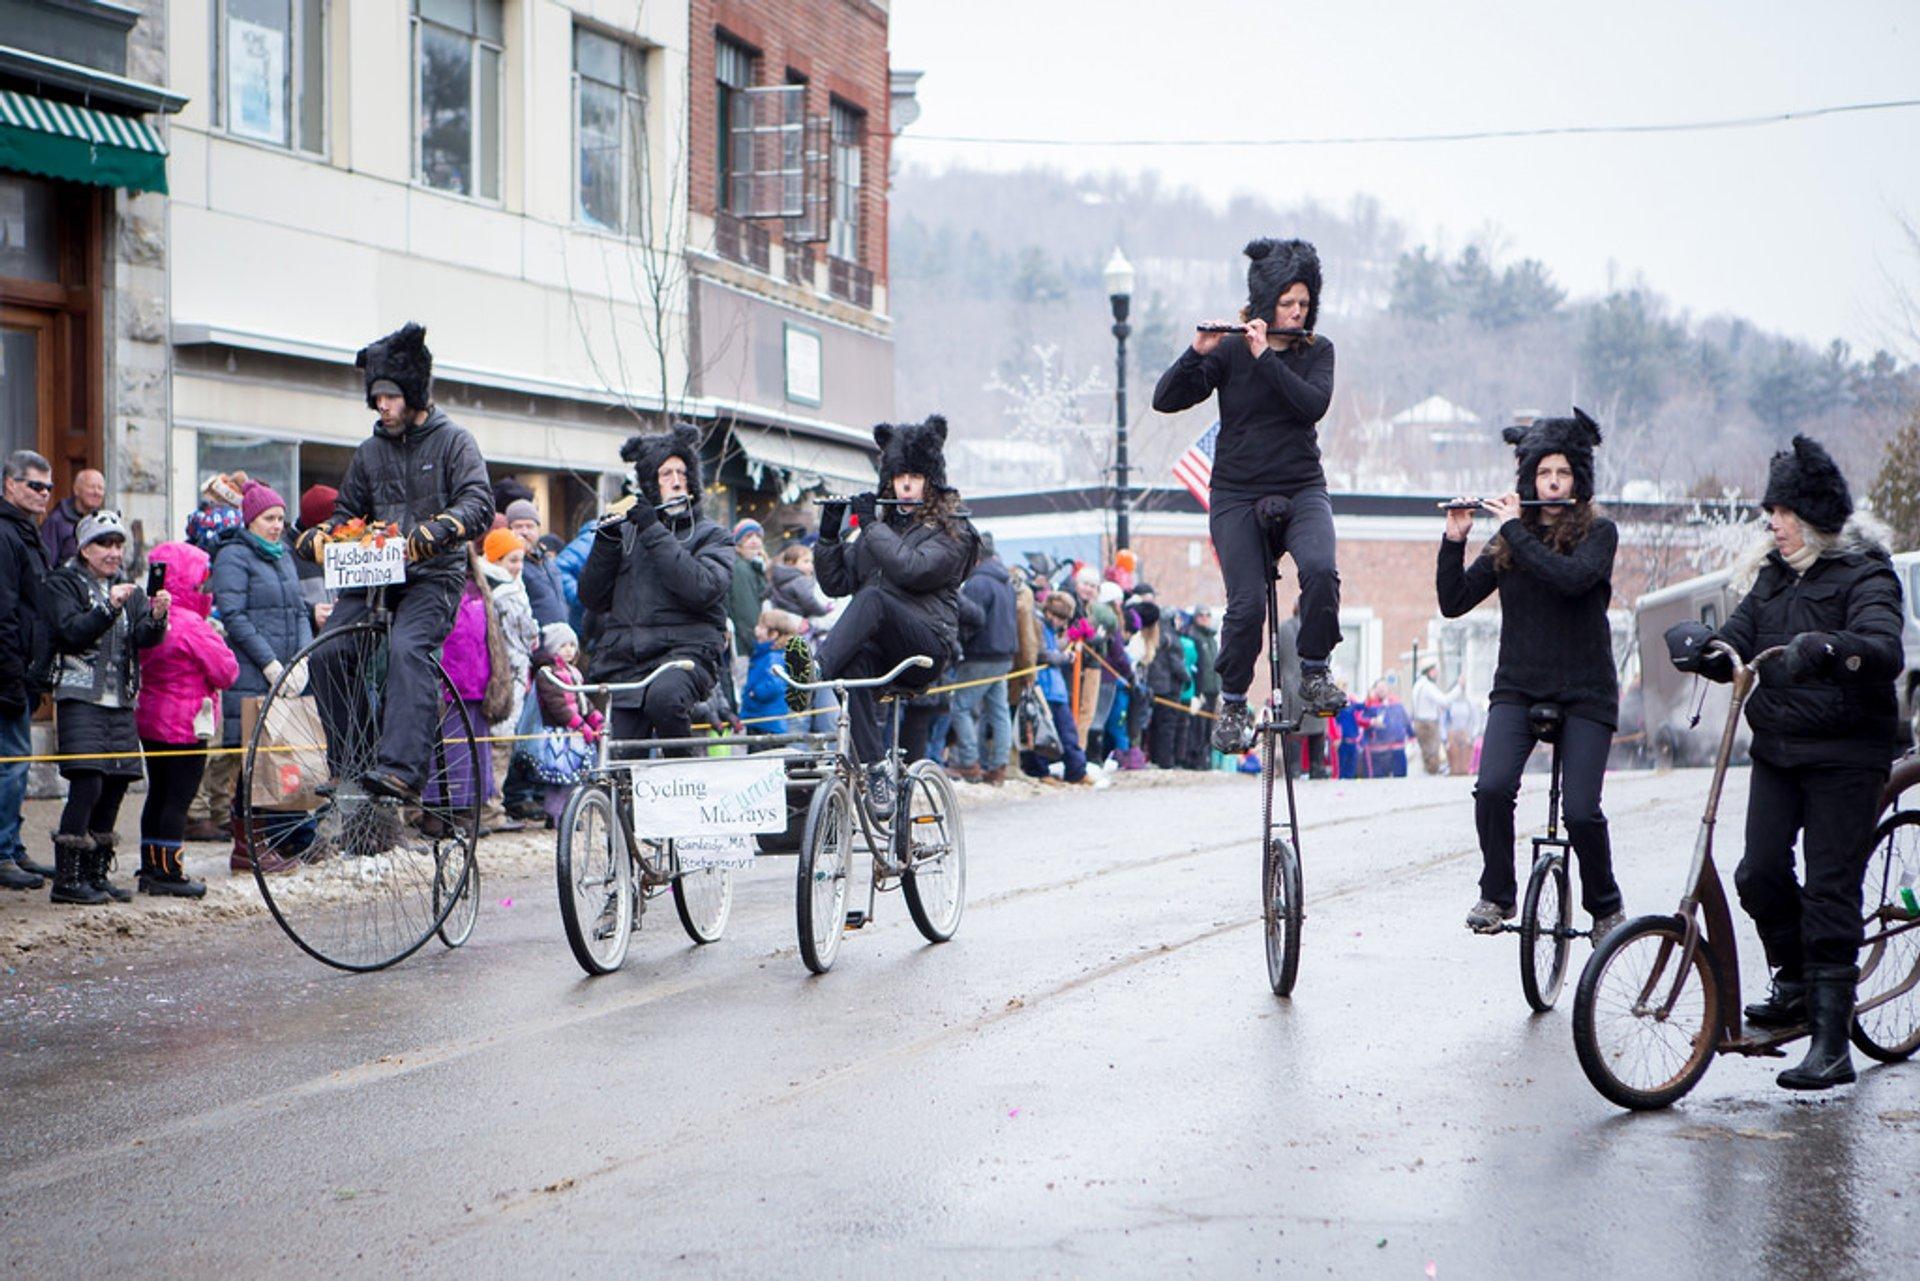 Saranac Lake Winter Carnival in New York State - Best Season 2020